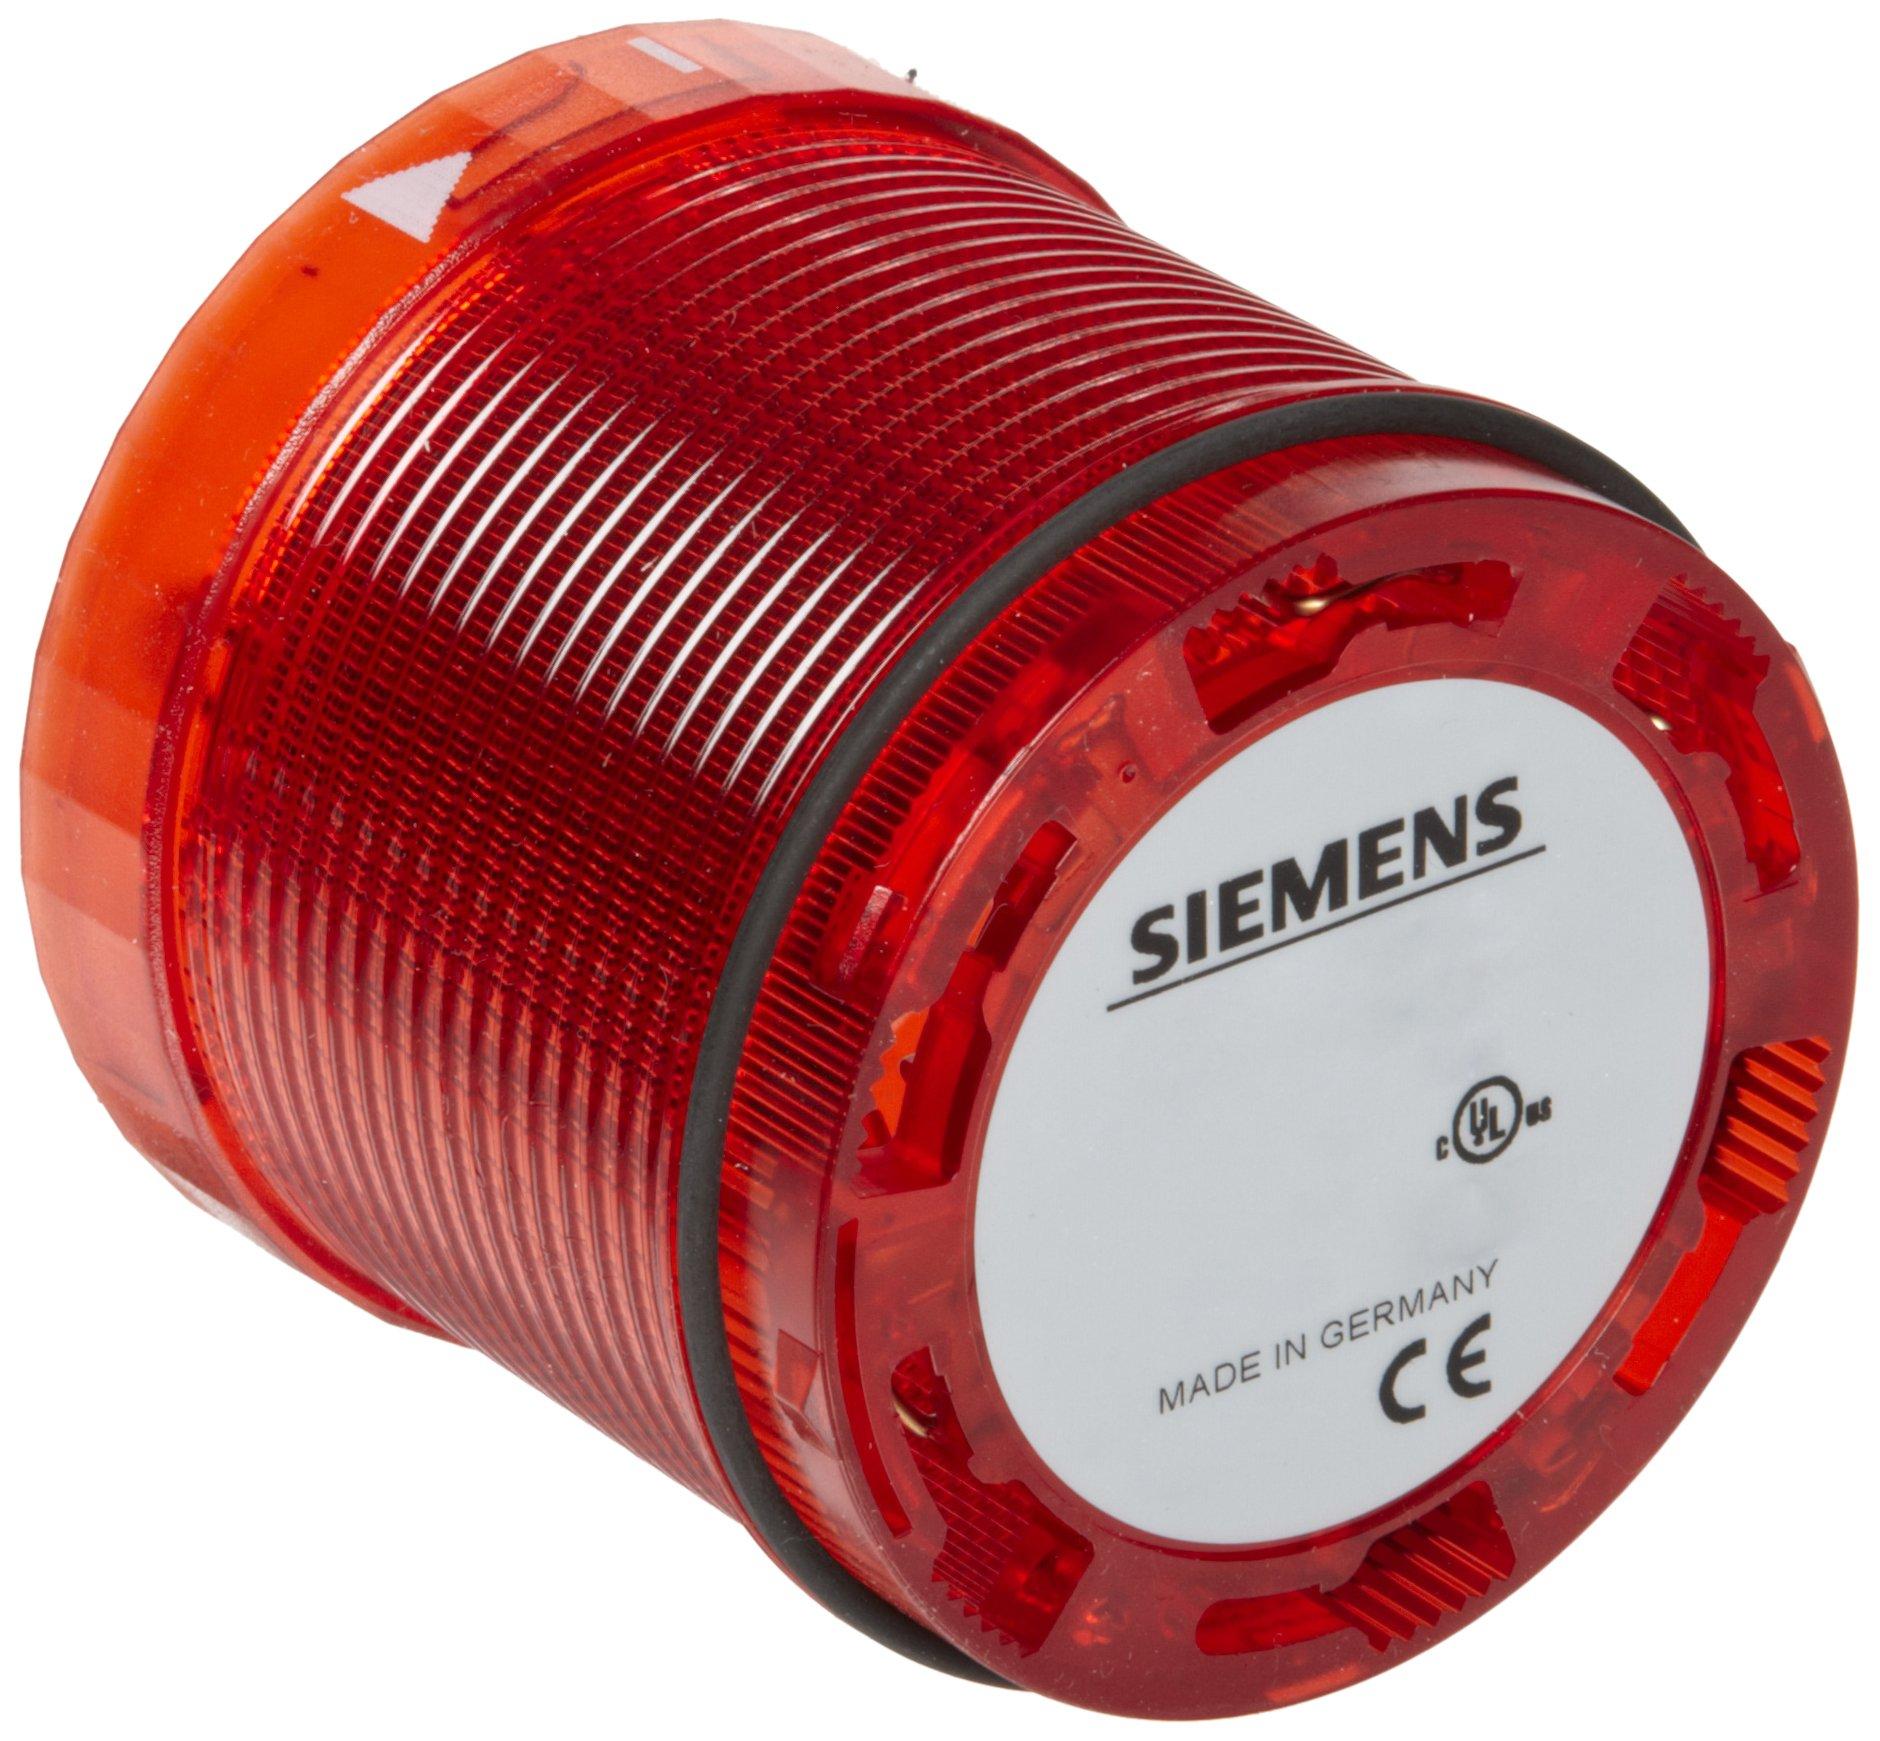 Siemens 8WD44 00-1AB Sirius Signal Column, Thermoplastic Enclosure, IP65 Protection, 70mm Diameter, Steady Light Element,